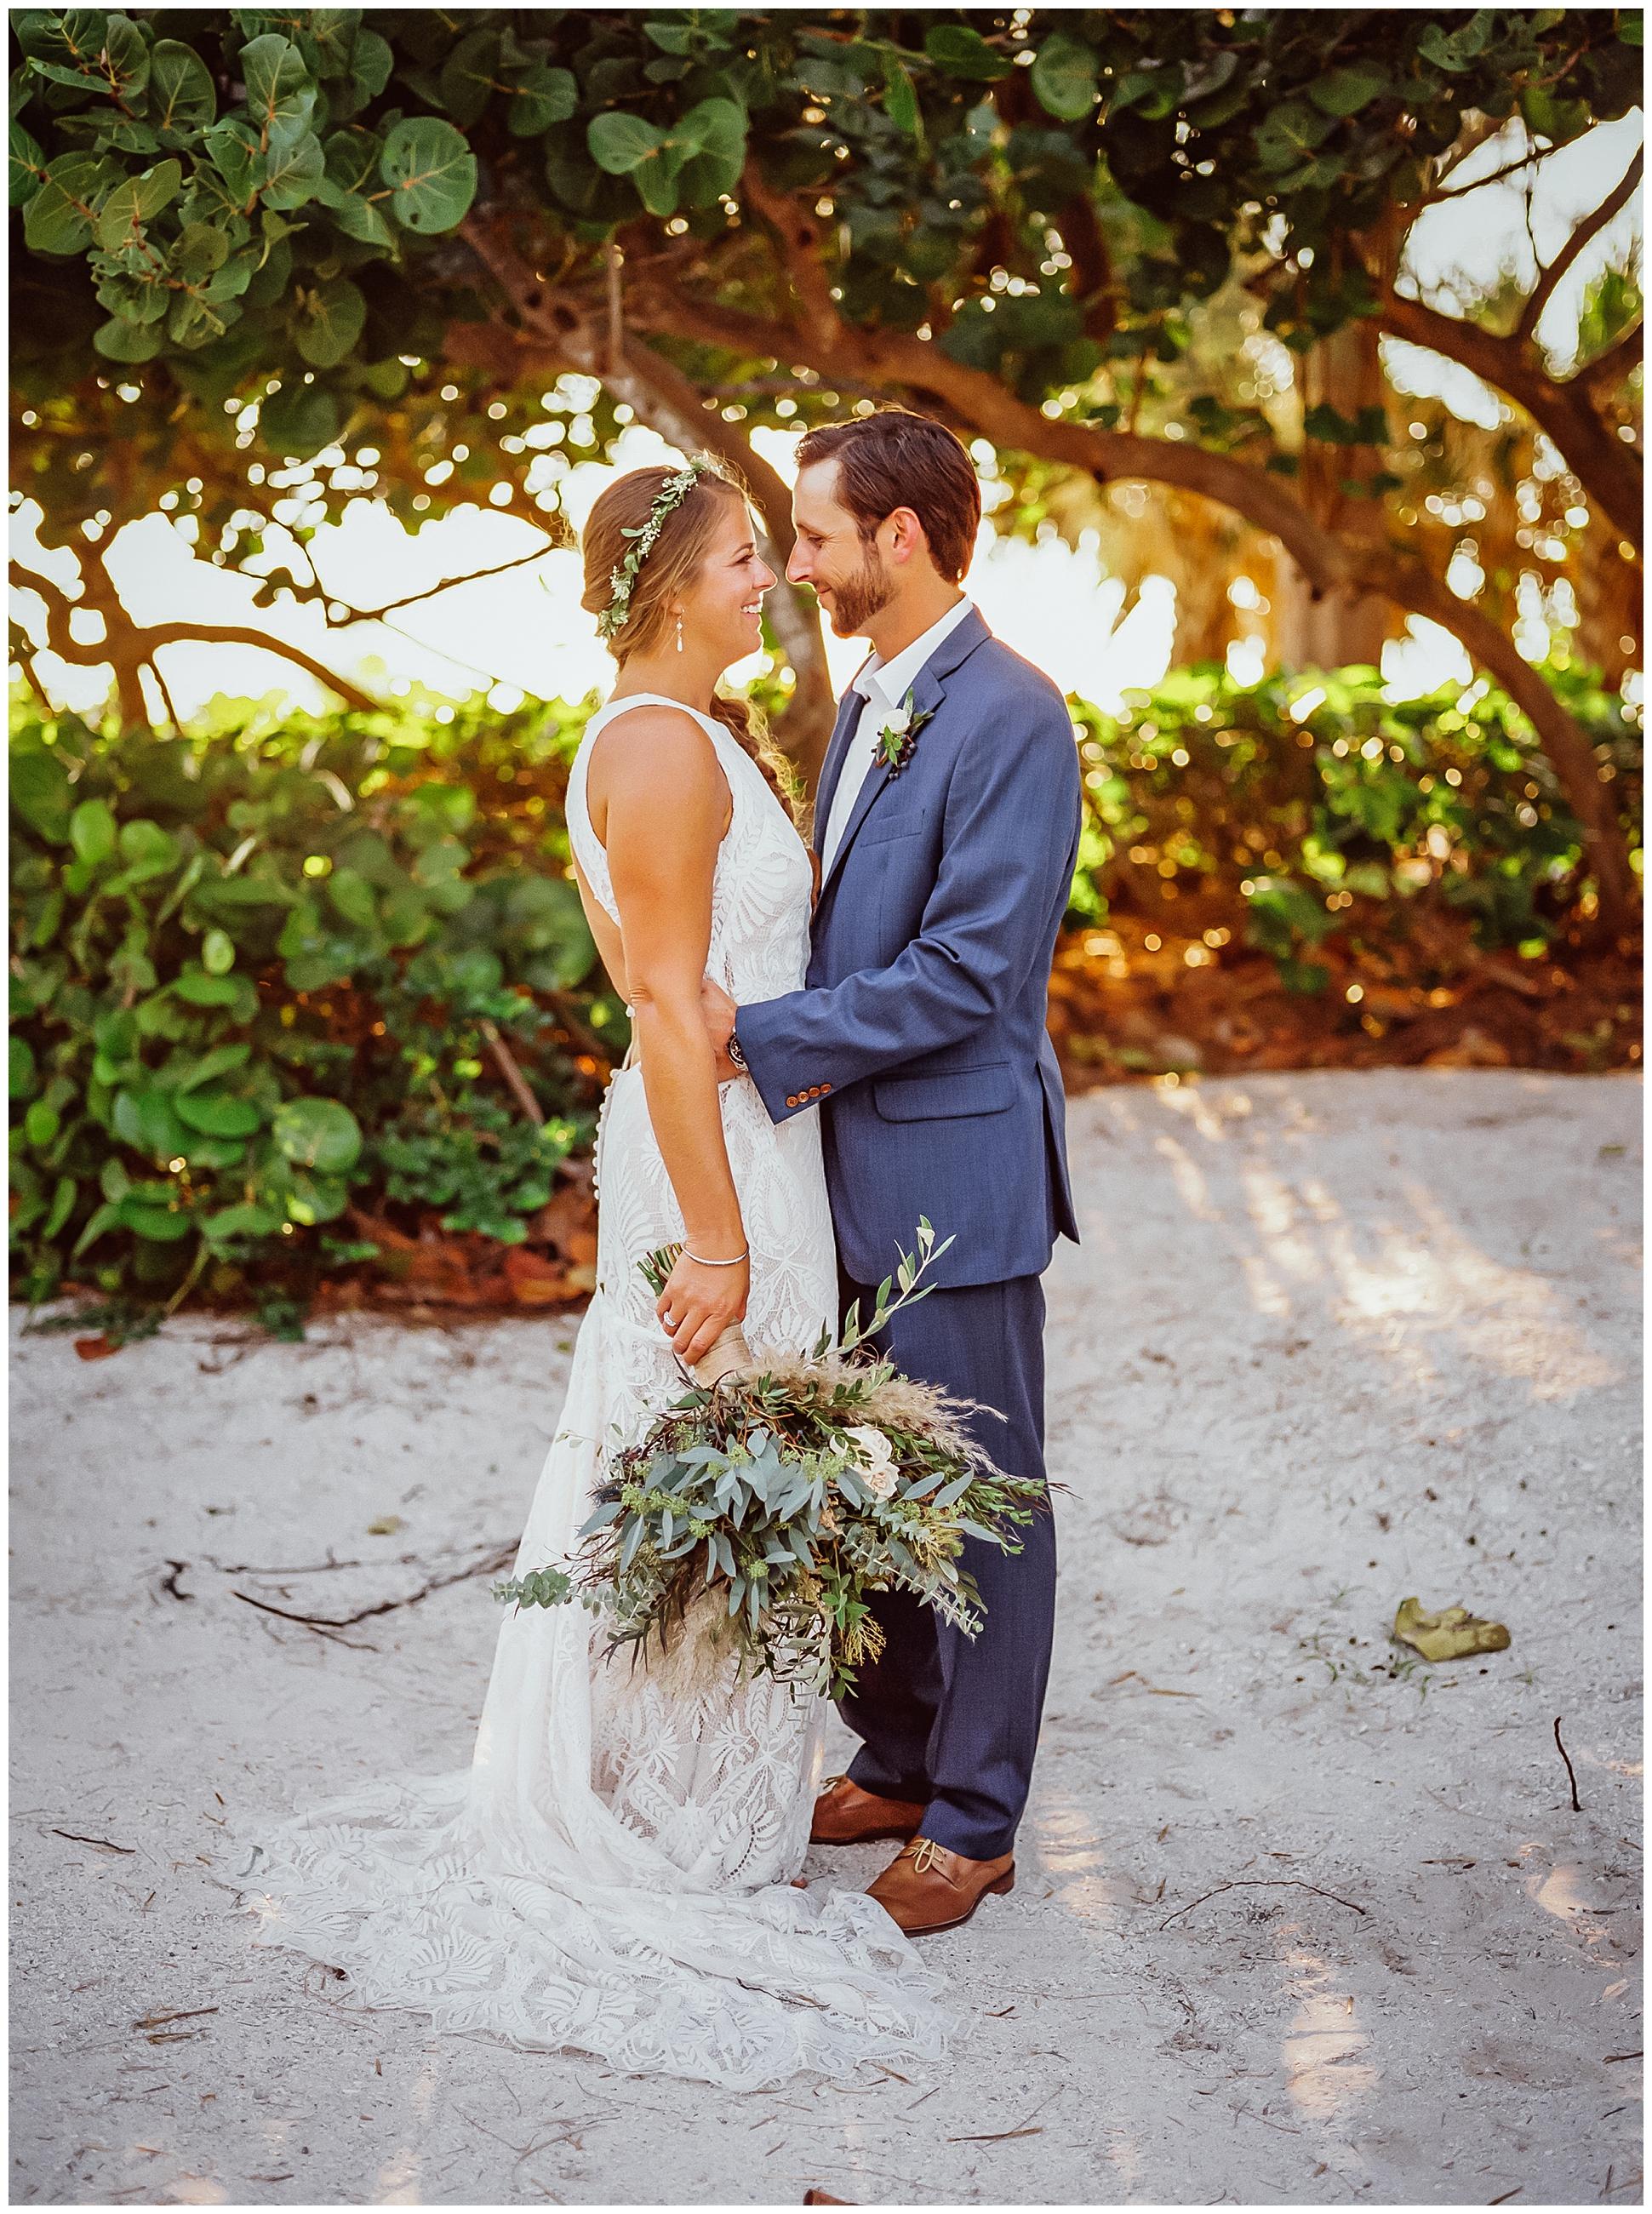 medium-format-film-vs-digital-wedding-photography-florida-beach_0015.jpg